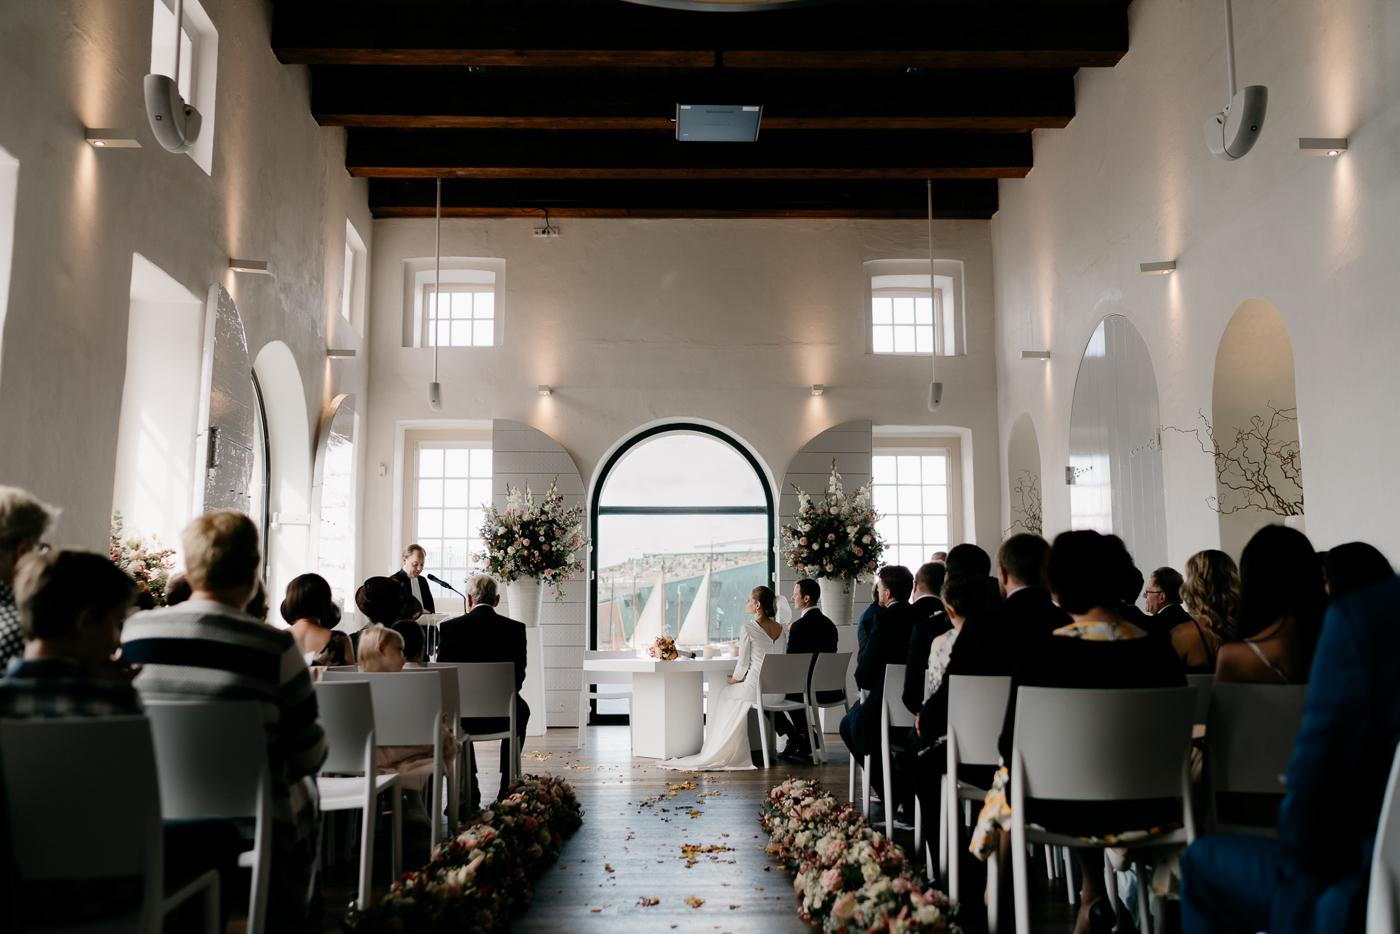 bruidsfotografie-trouwfotograaf-wedding-photographer-amsterdam-James-Jantine-161.jpg